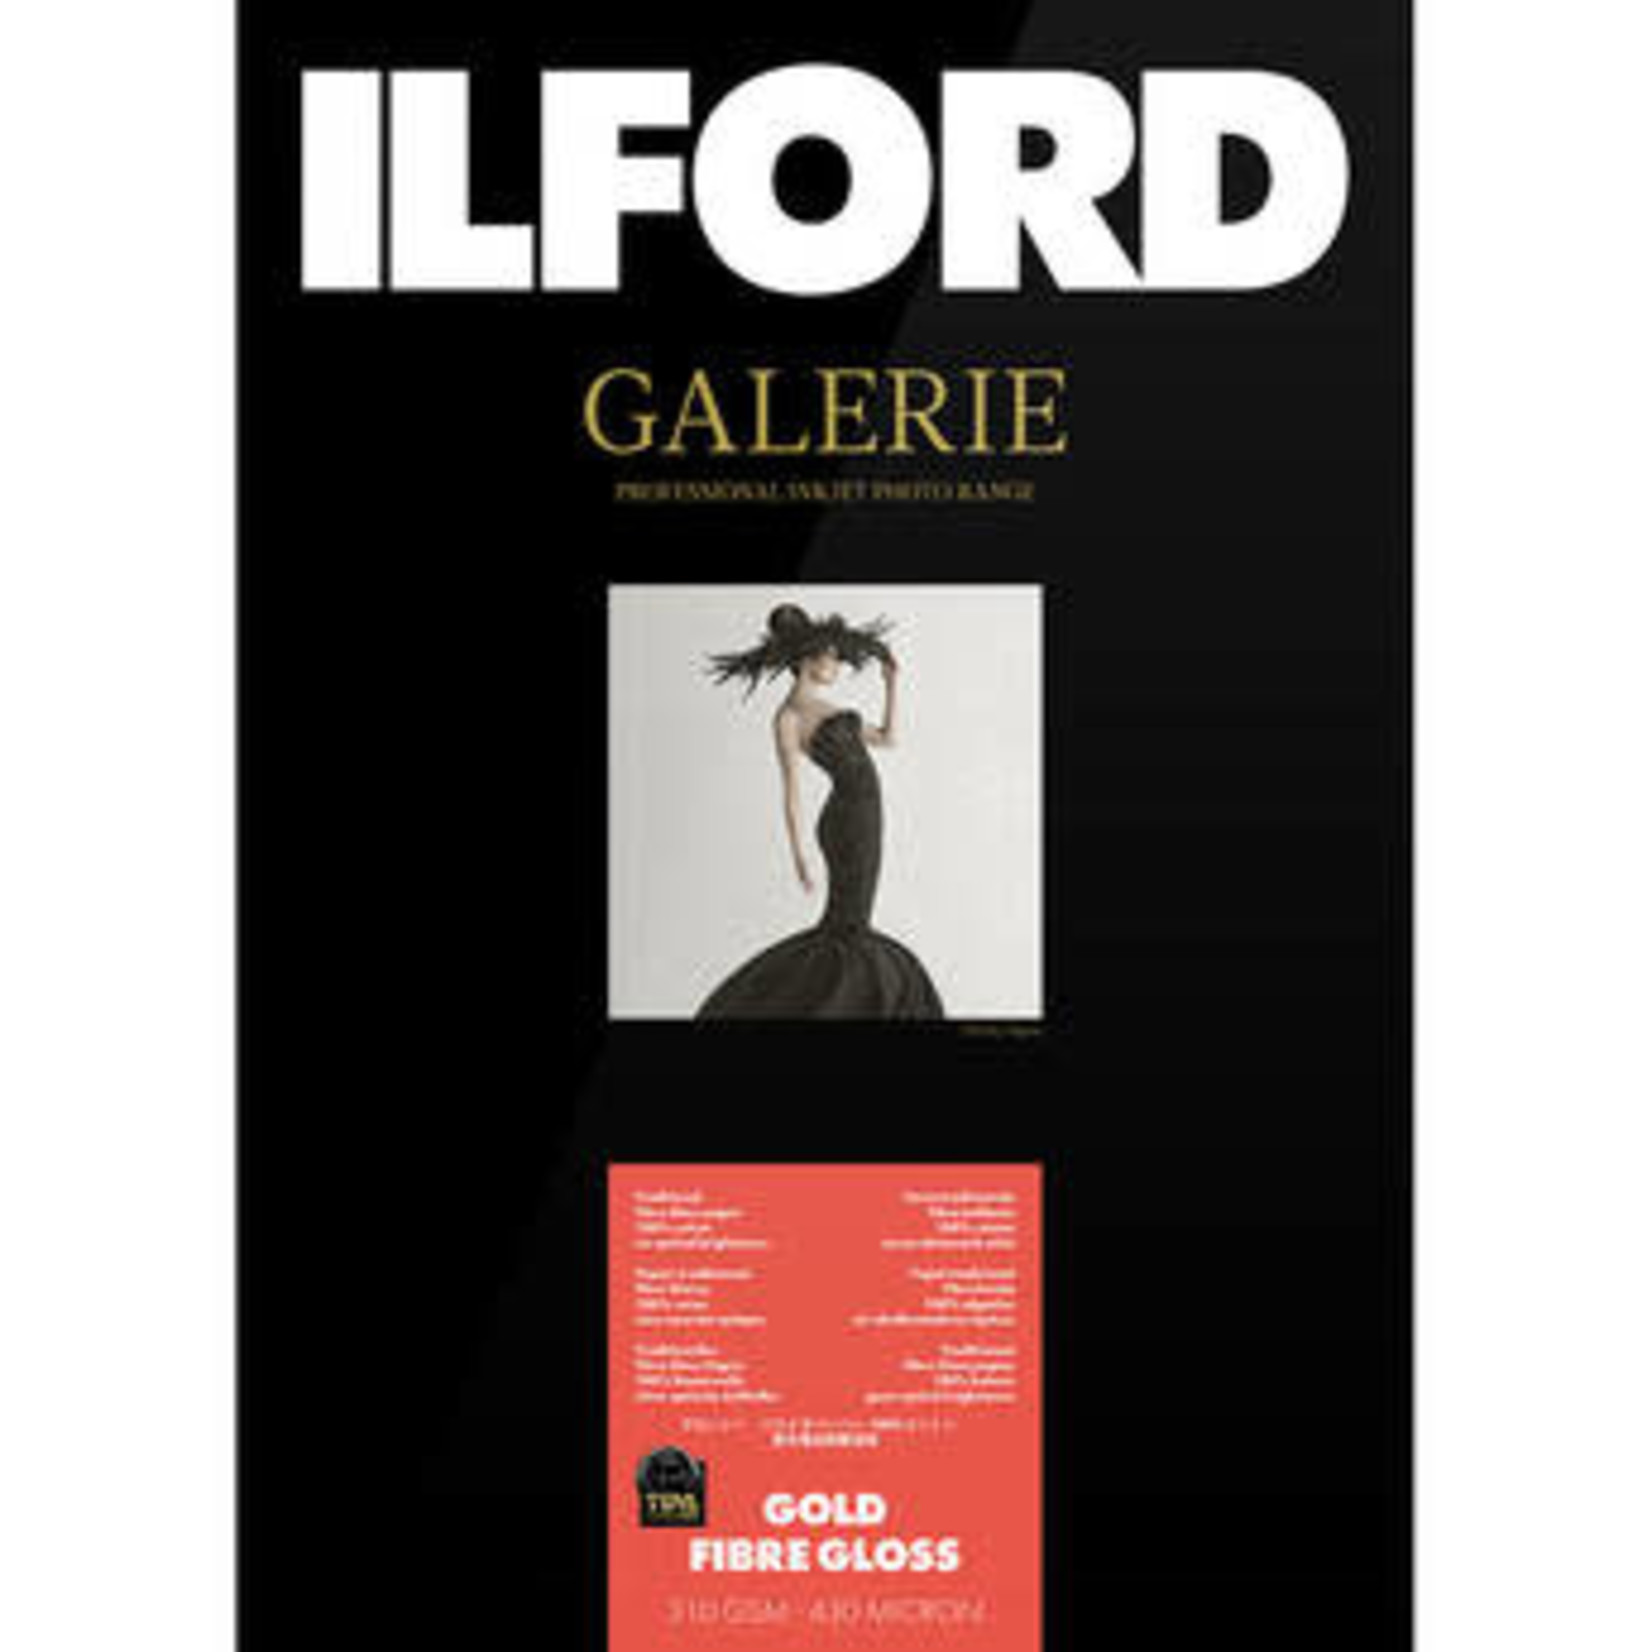 Ilford Galerie Gold Fibre Gloss 8.5x11 (25 PK)